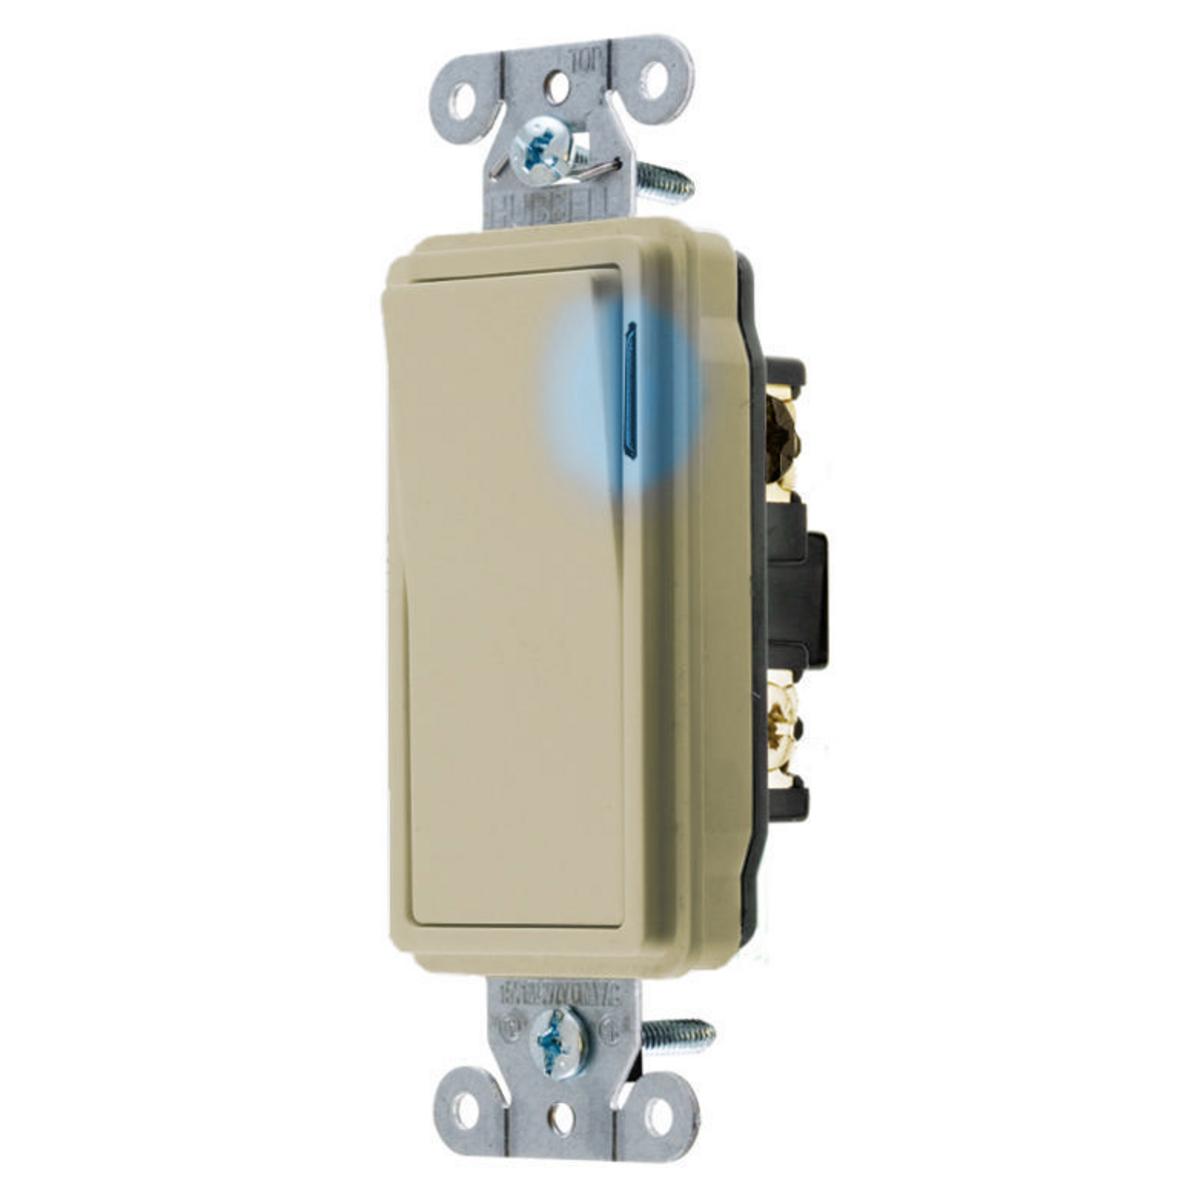 Hubbell DS320IL SWITCH, DECO SER, 3W, 20A 120/277V, ILIV